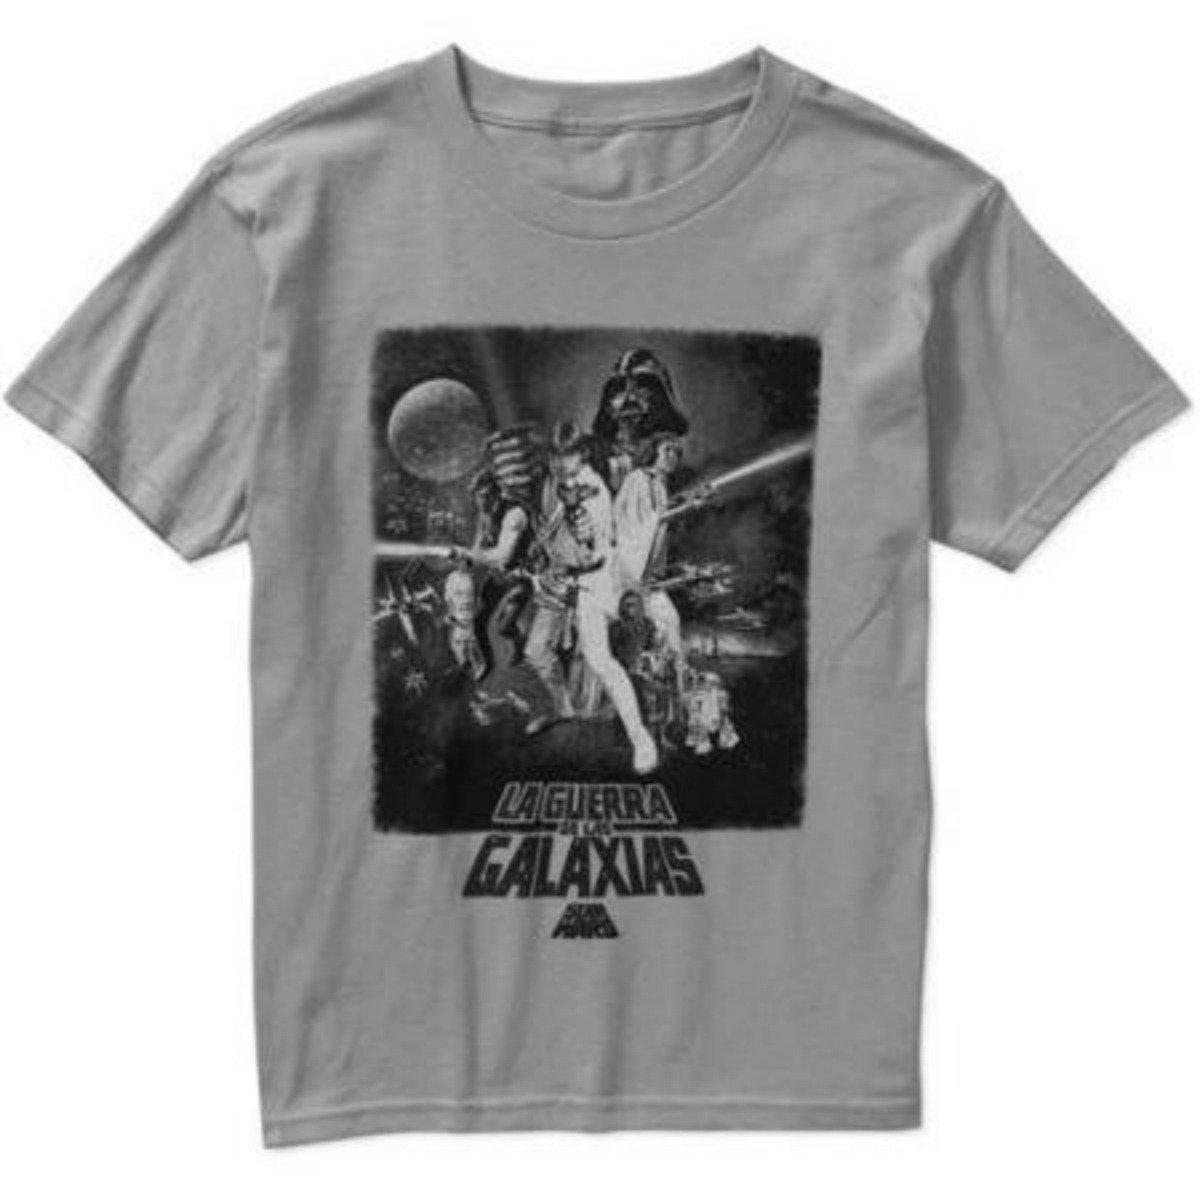 Star Wars Vintage Spanish Movie Poster T-Shirt For Boys 0